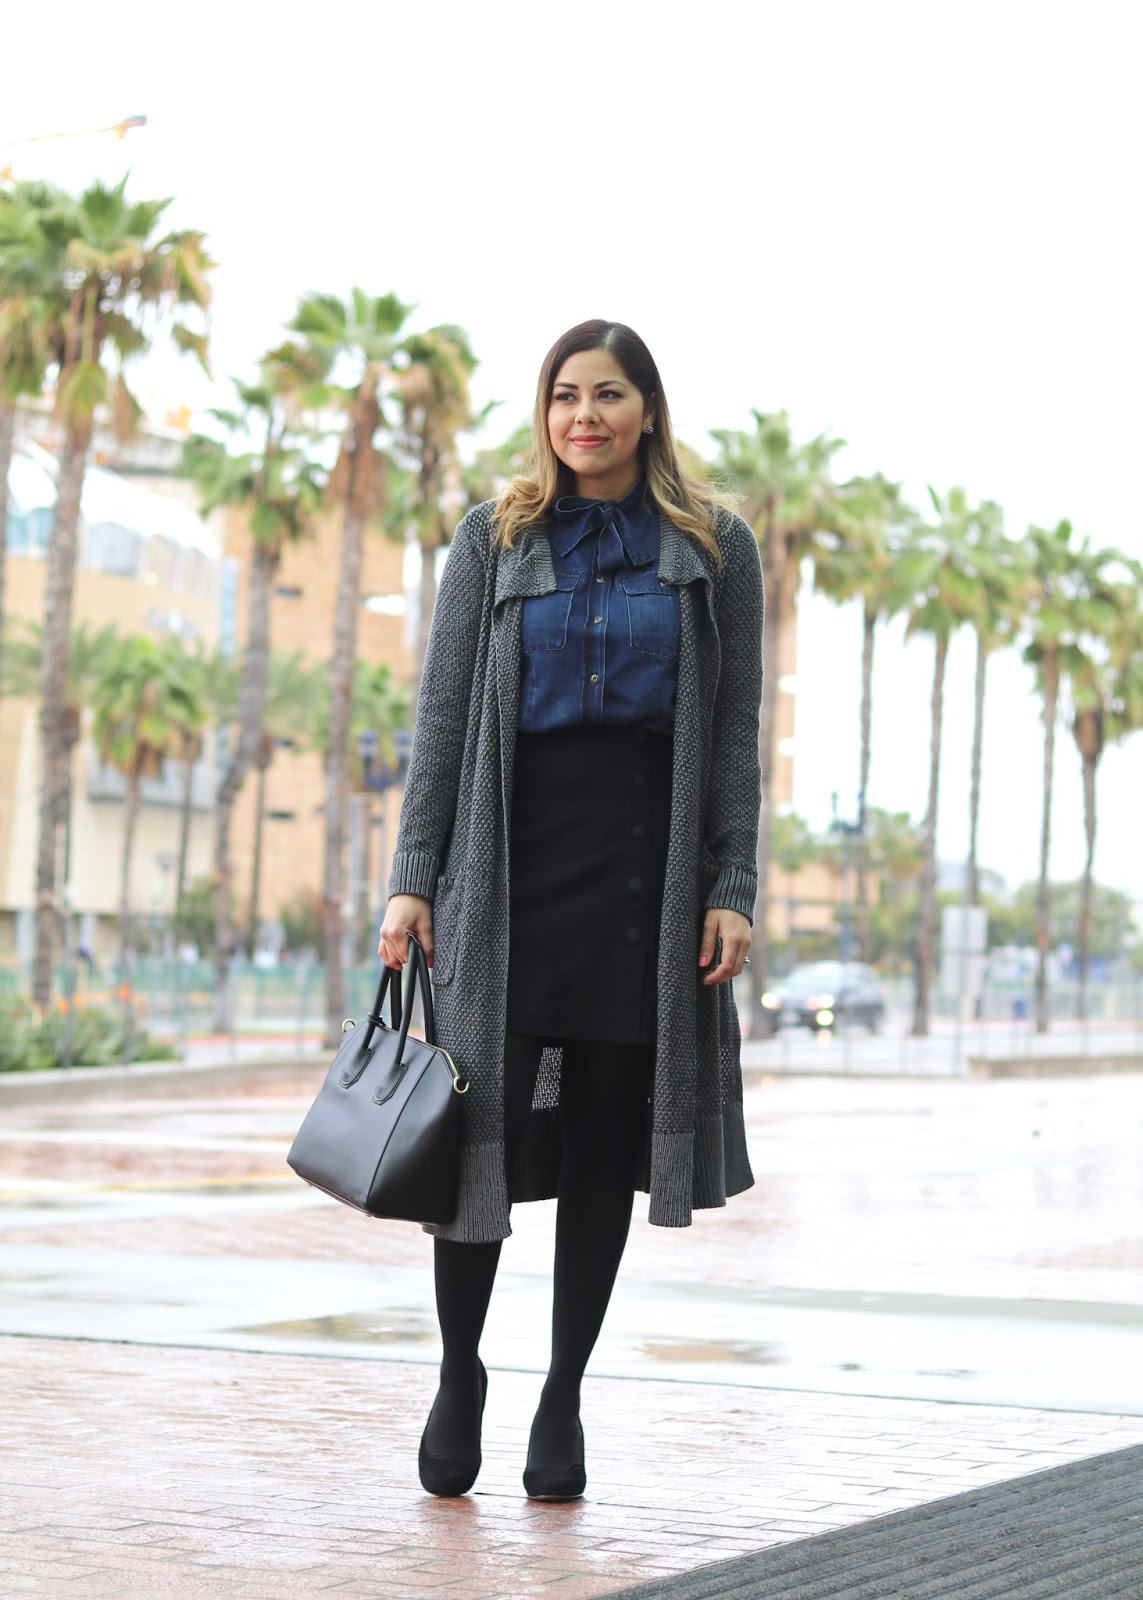 cabi Scoop San Diego 2017, San Diego Fashion Blogger, San Diego Style Blogger